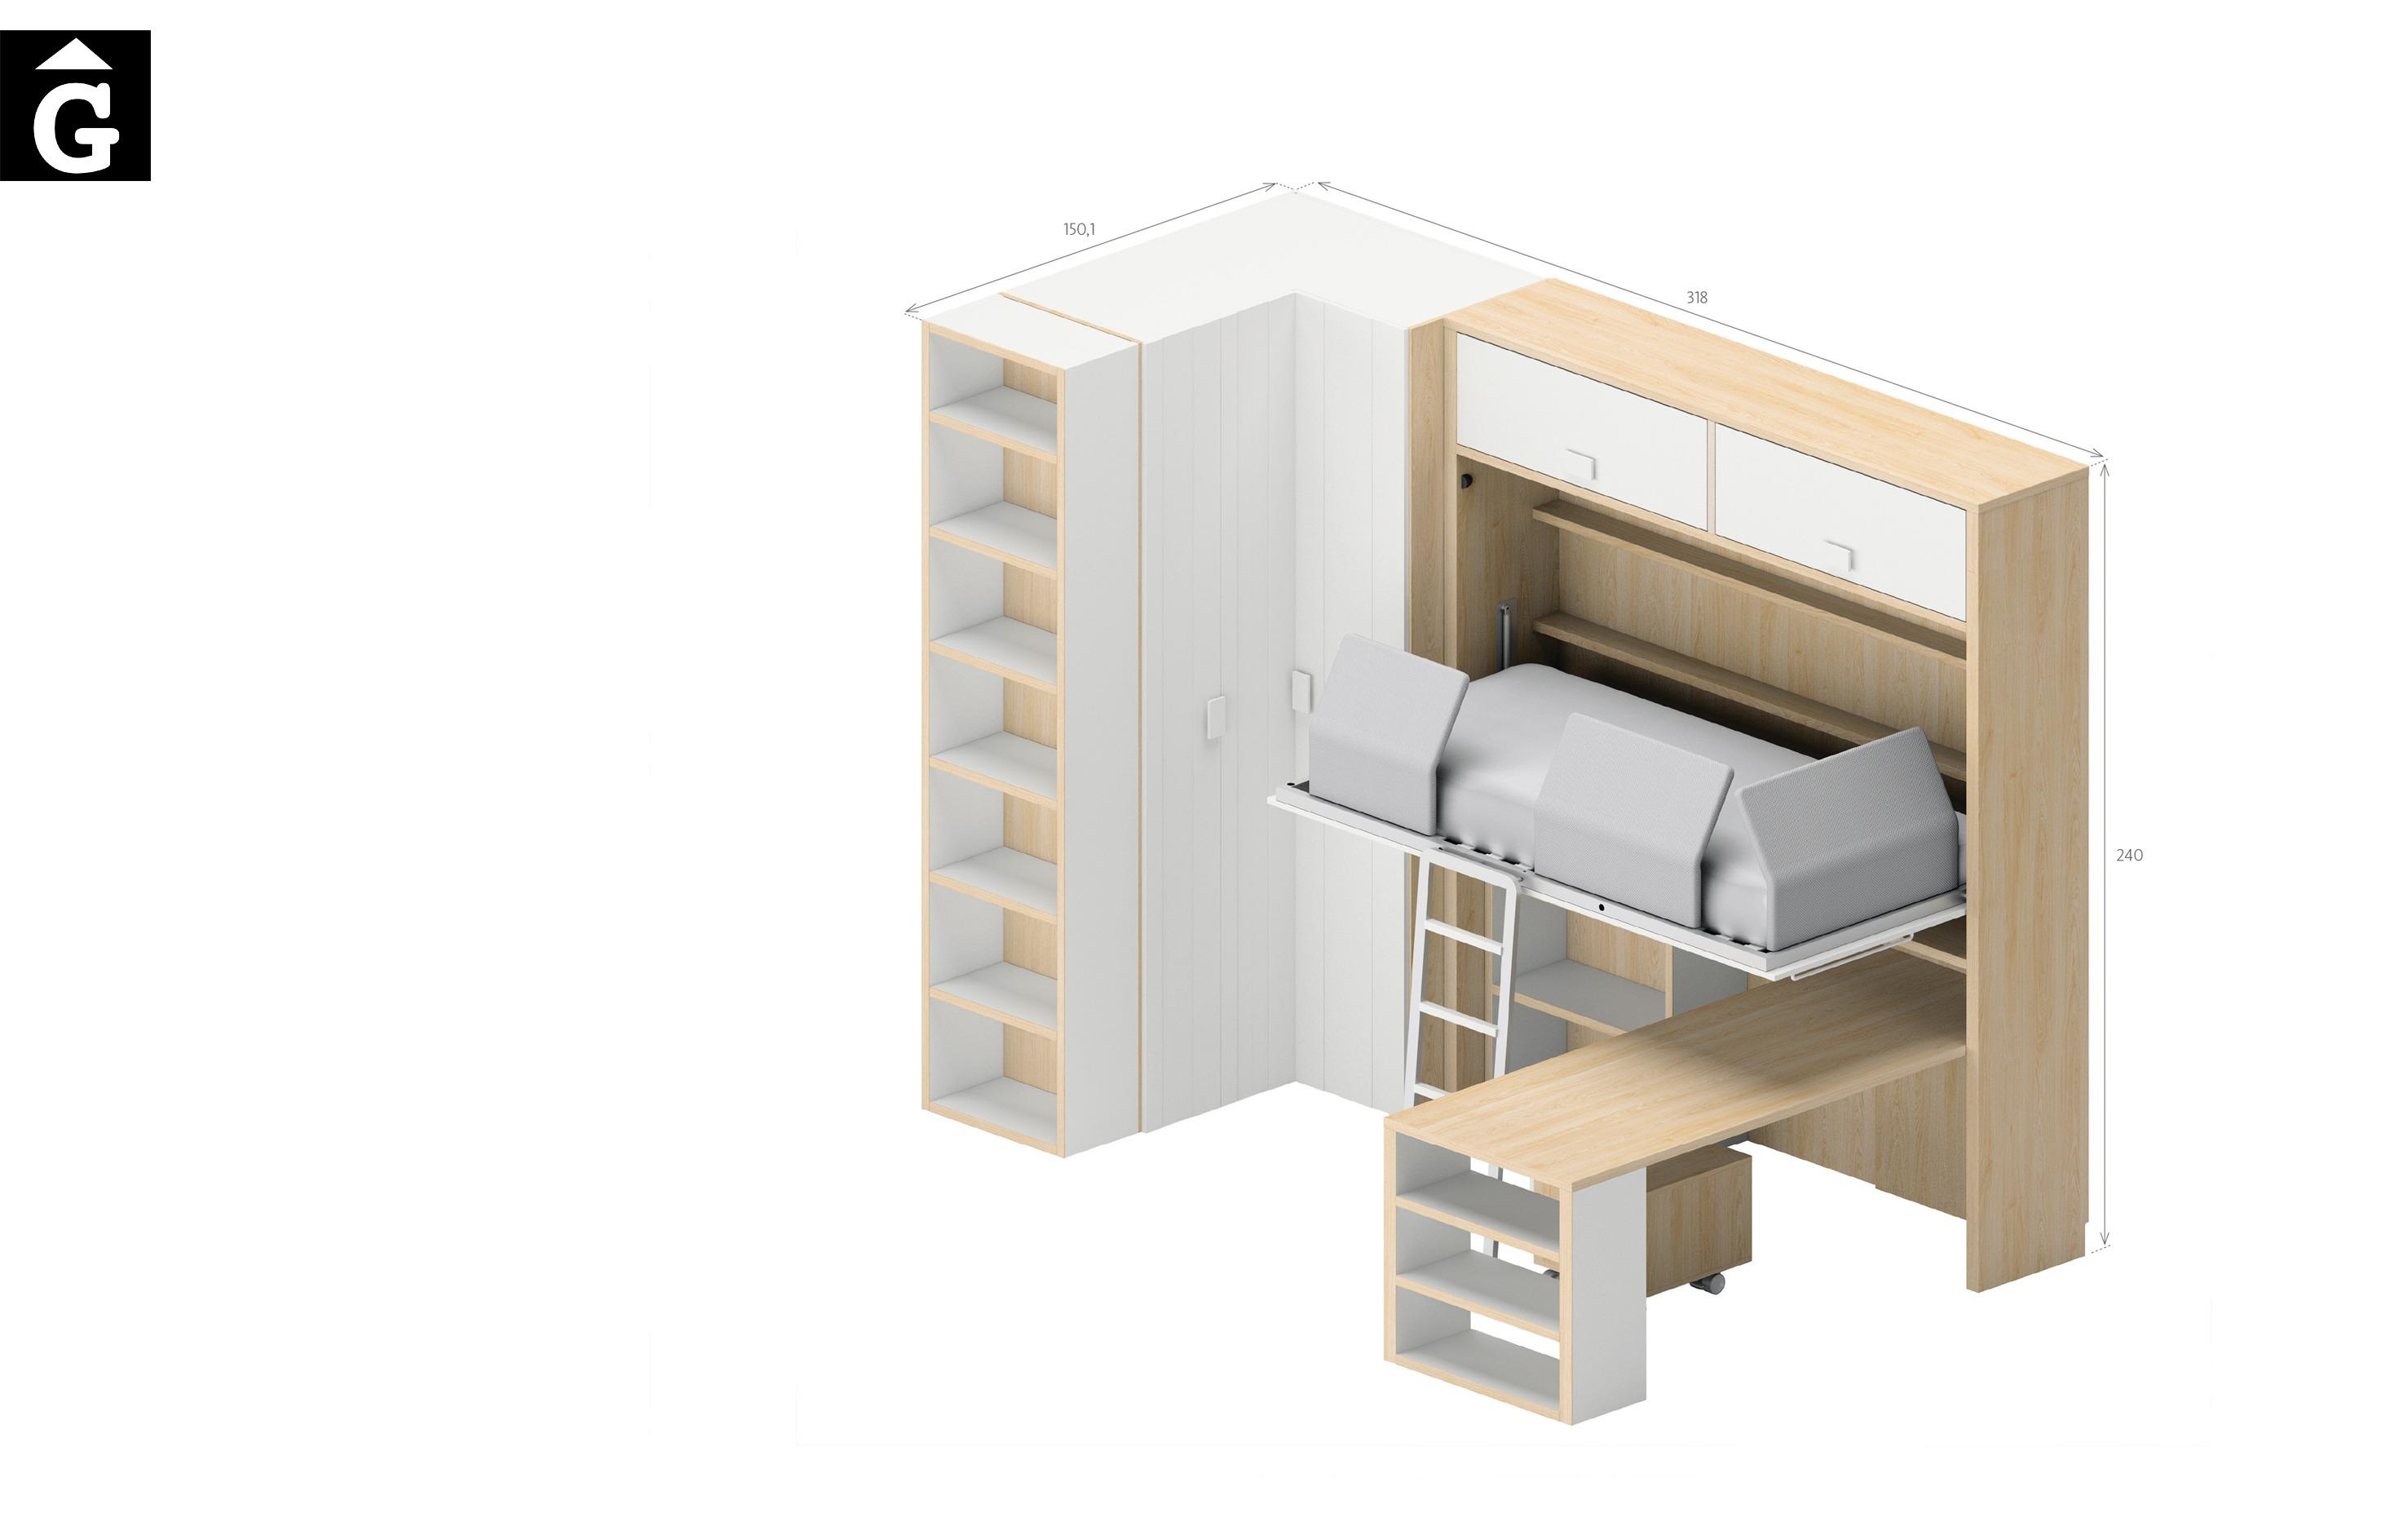 Copenhague llit plegable alt obert croquis Lagrama by mobles Gifreu